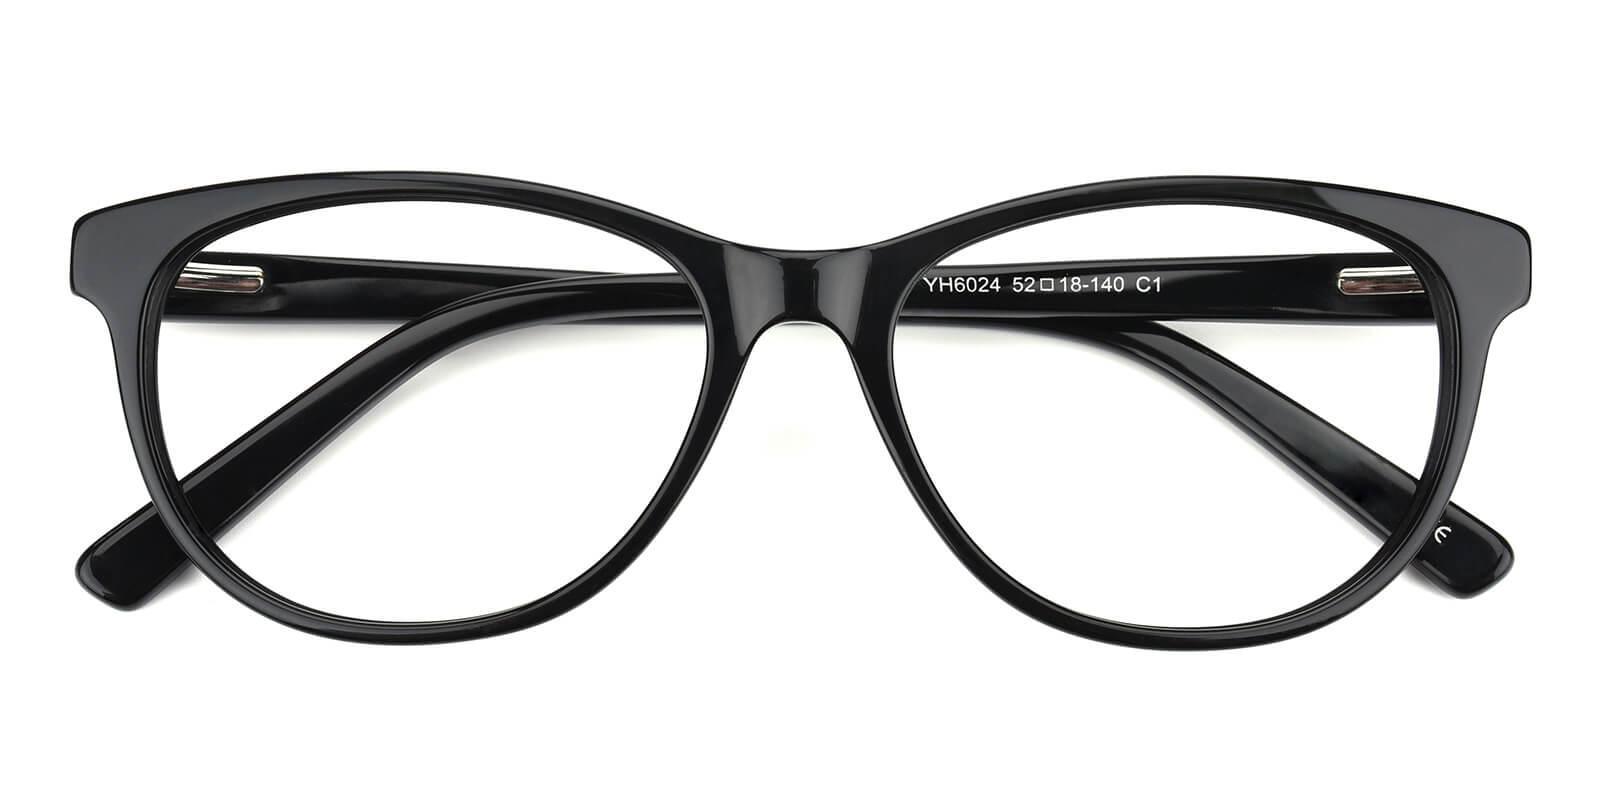 Neptunus-Black-Cat-Acetate-Eyeglasses-detail